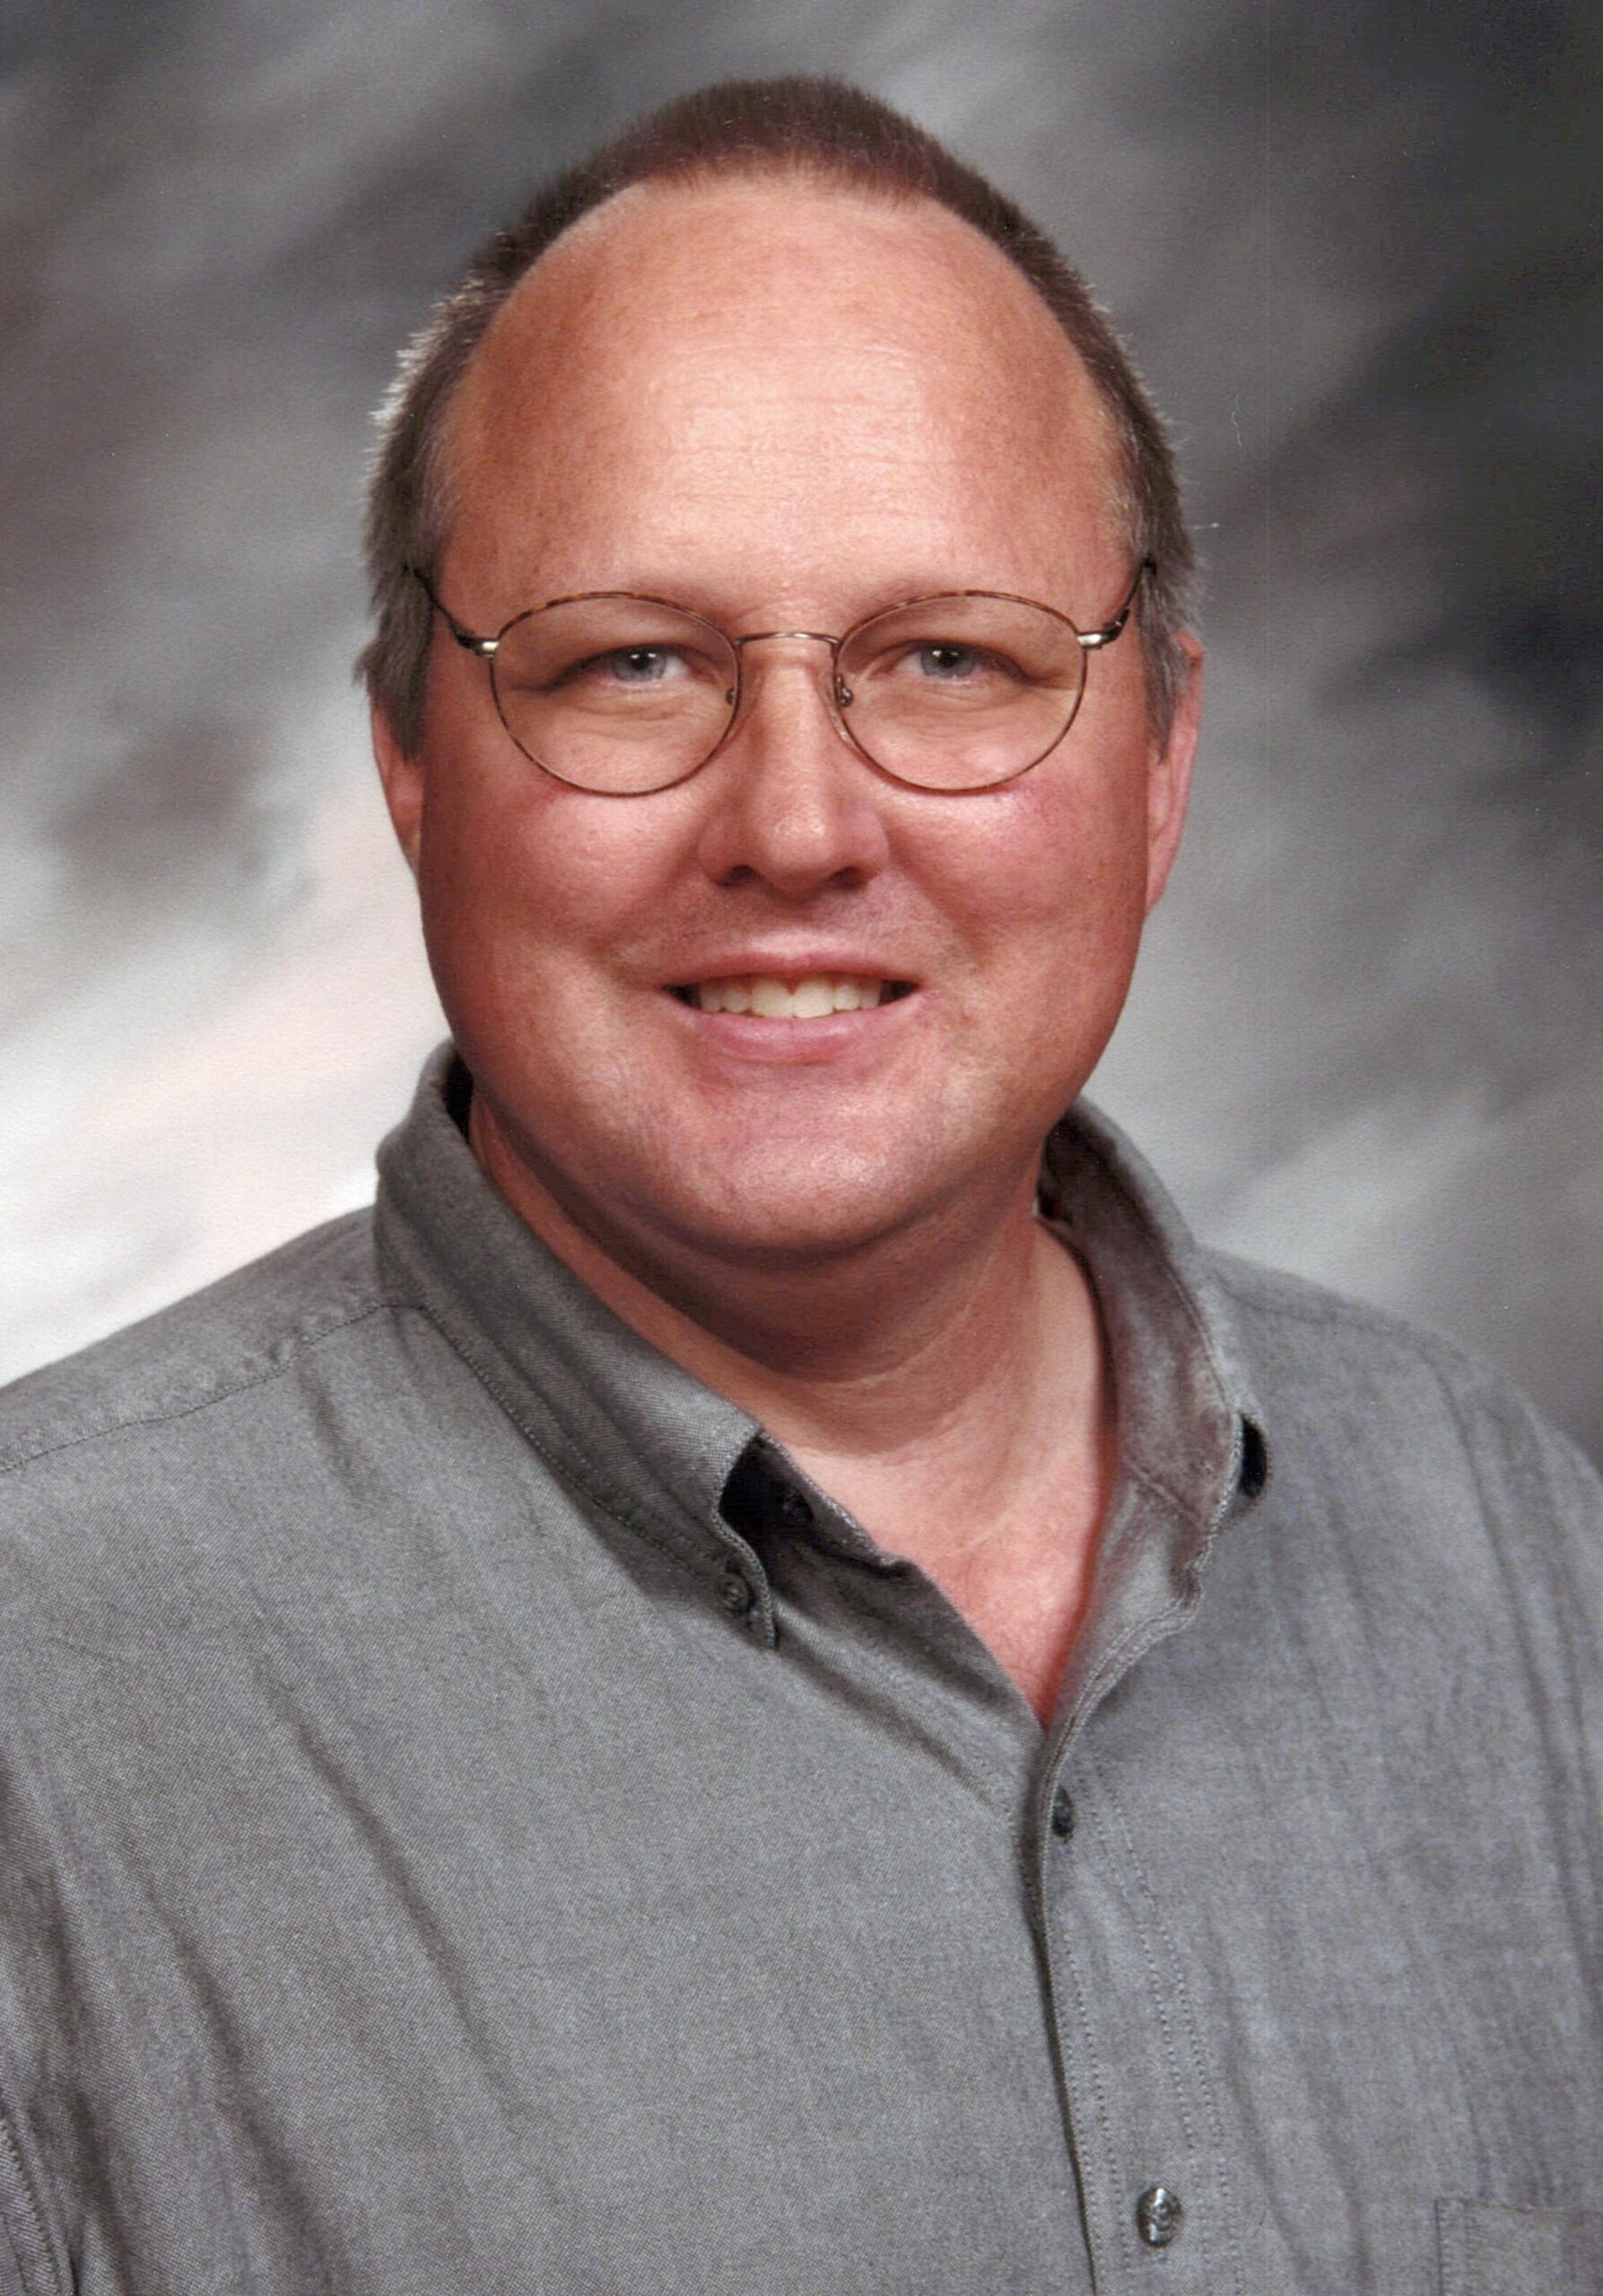 Carl Reay Allred